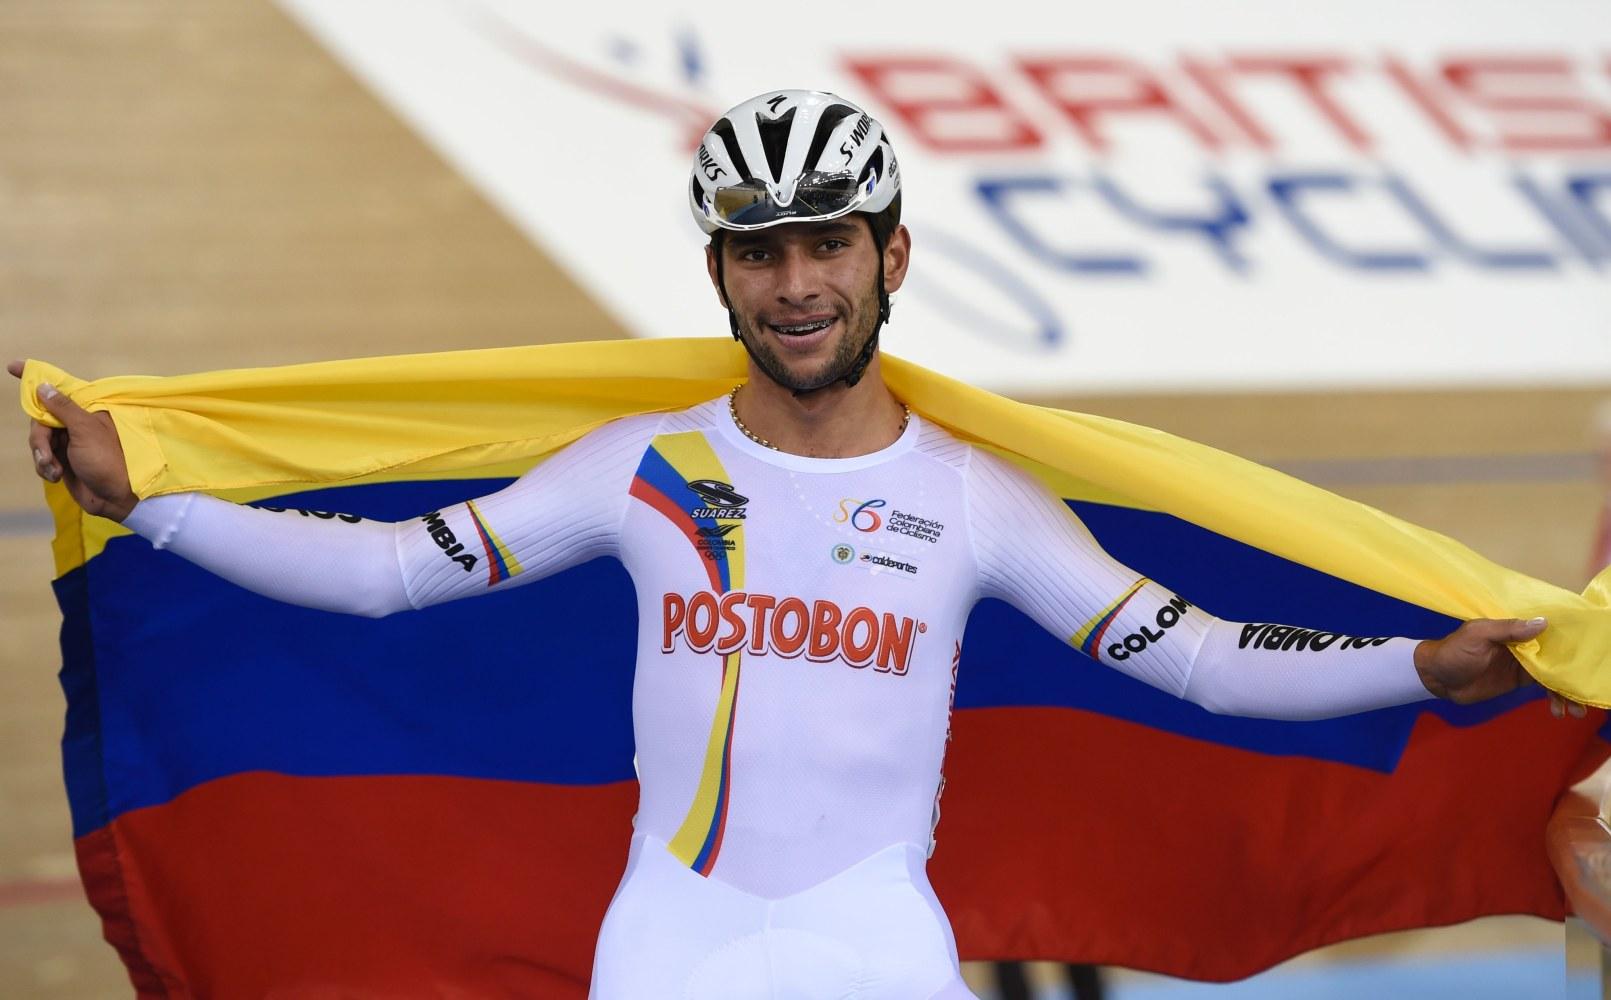 Colombian cycling team women names - Colombia S Fernando Gaviria Rendon Celebrates After Winning The Men S Omnium